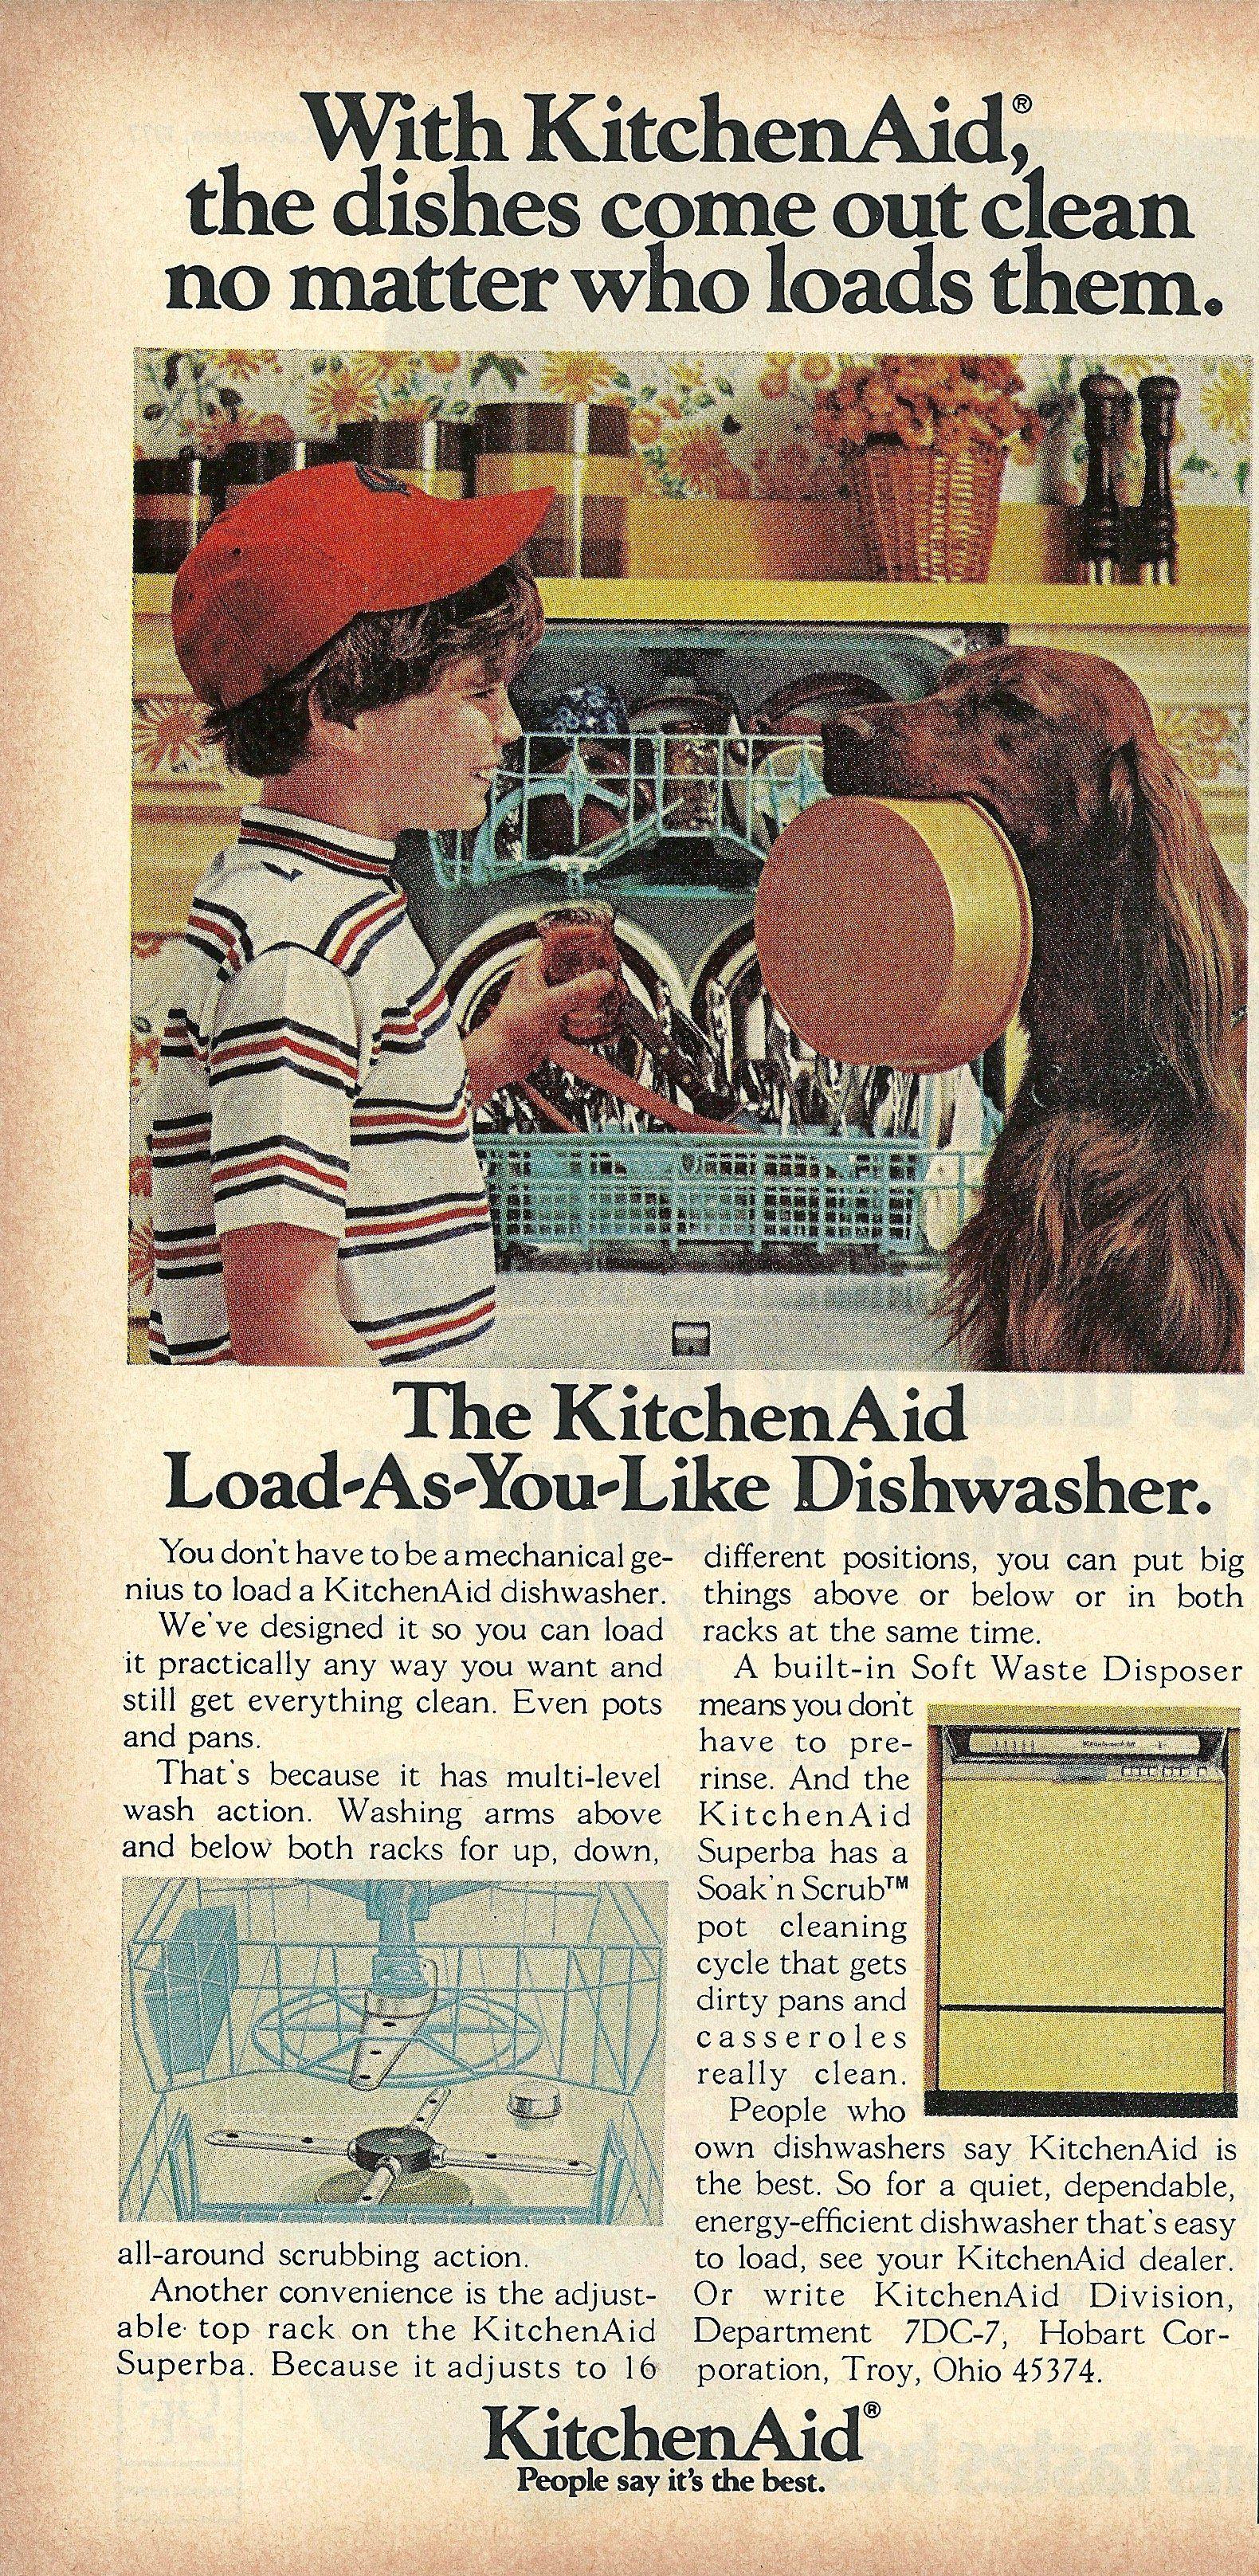 kitchenaid superba dishwasher vintage